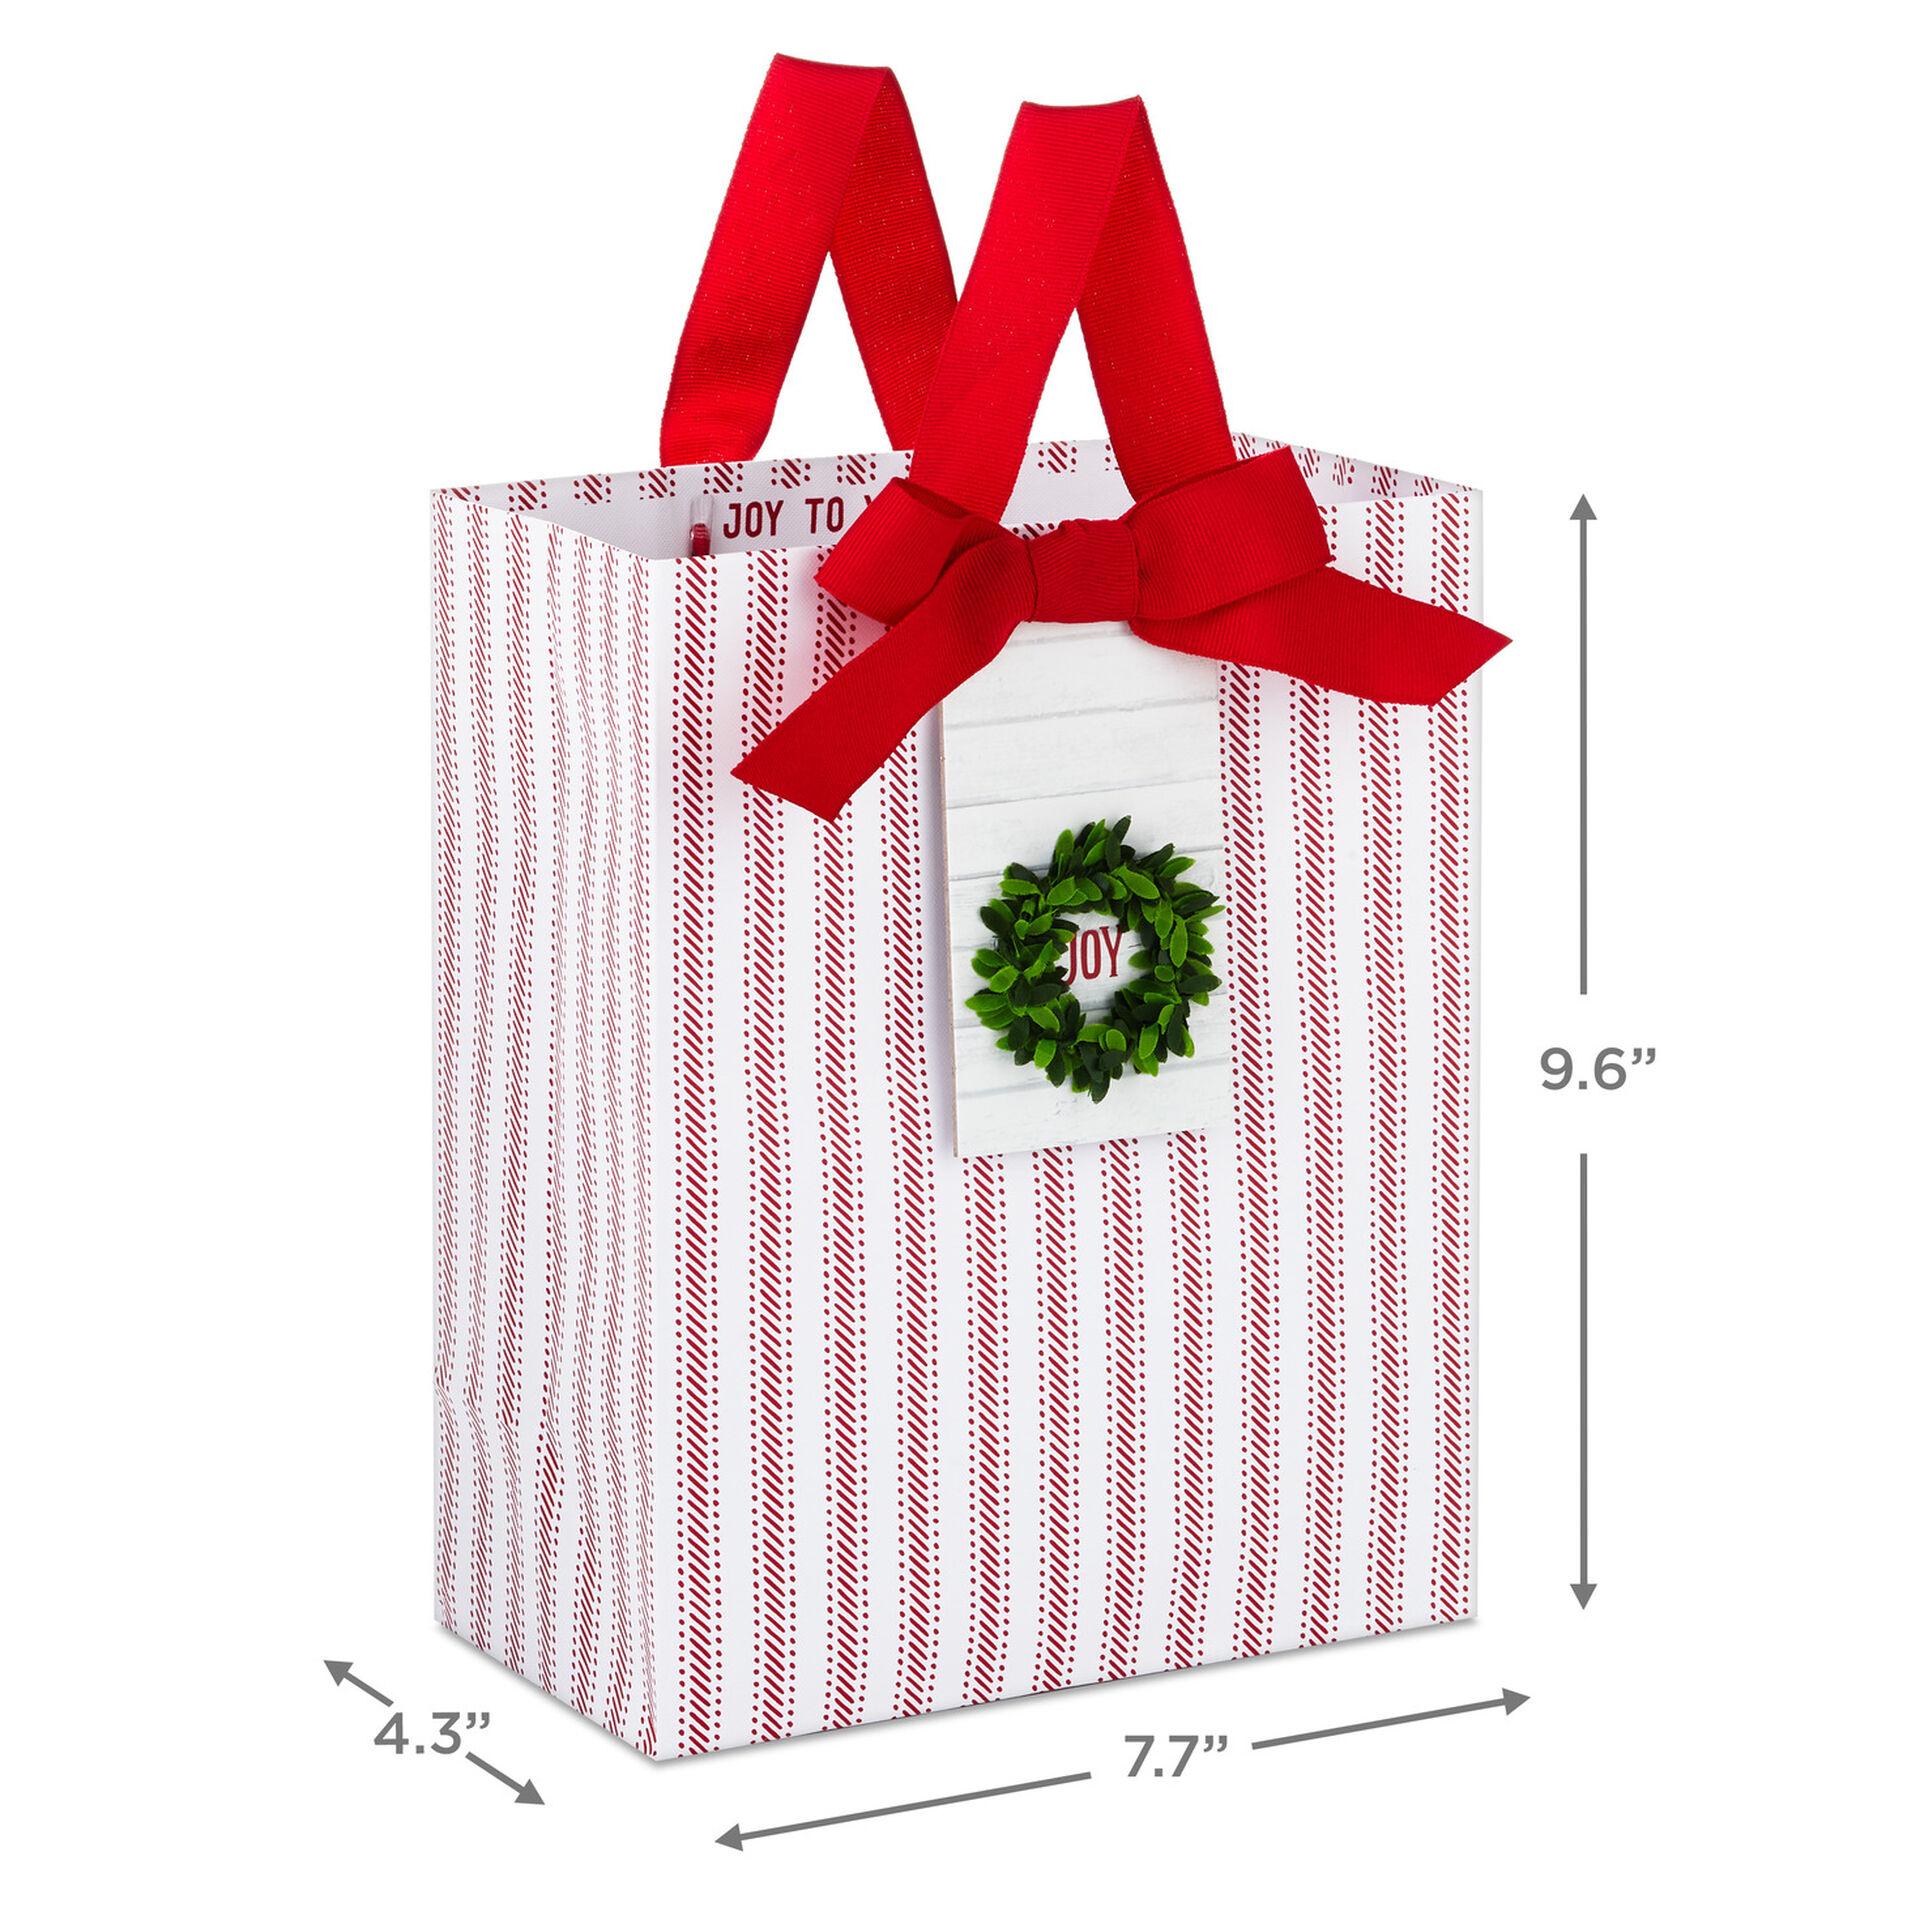 9 6 Joy Wreath On Red Ticking Gift Bag Gift Bags Hallmark